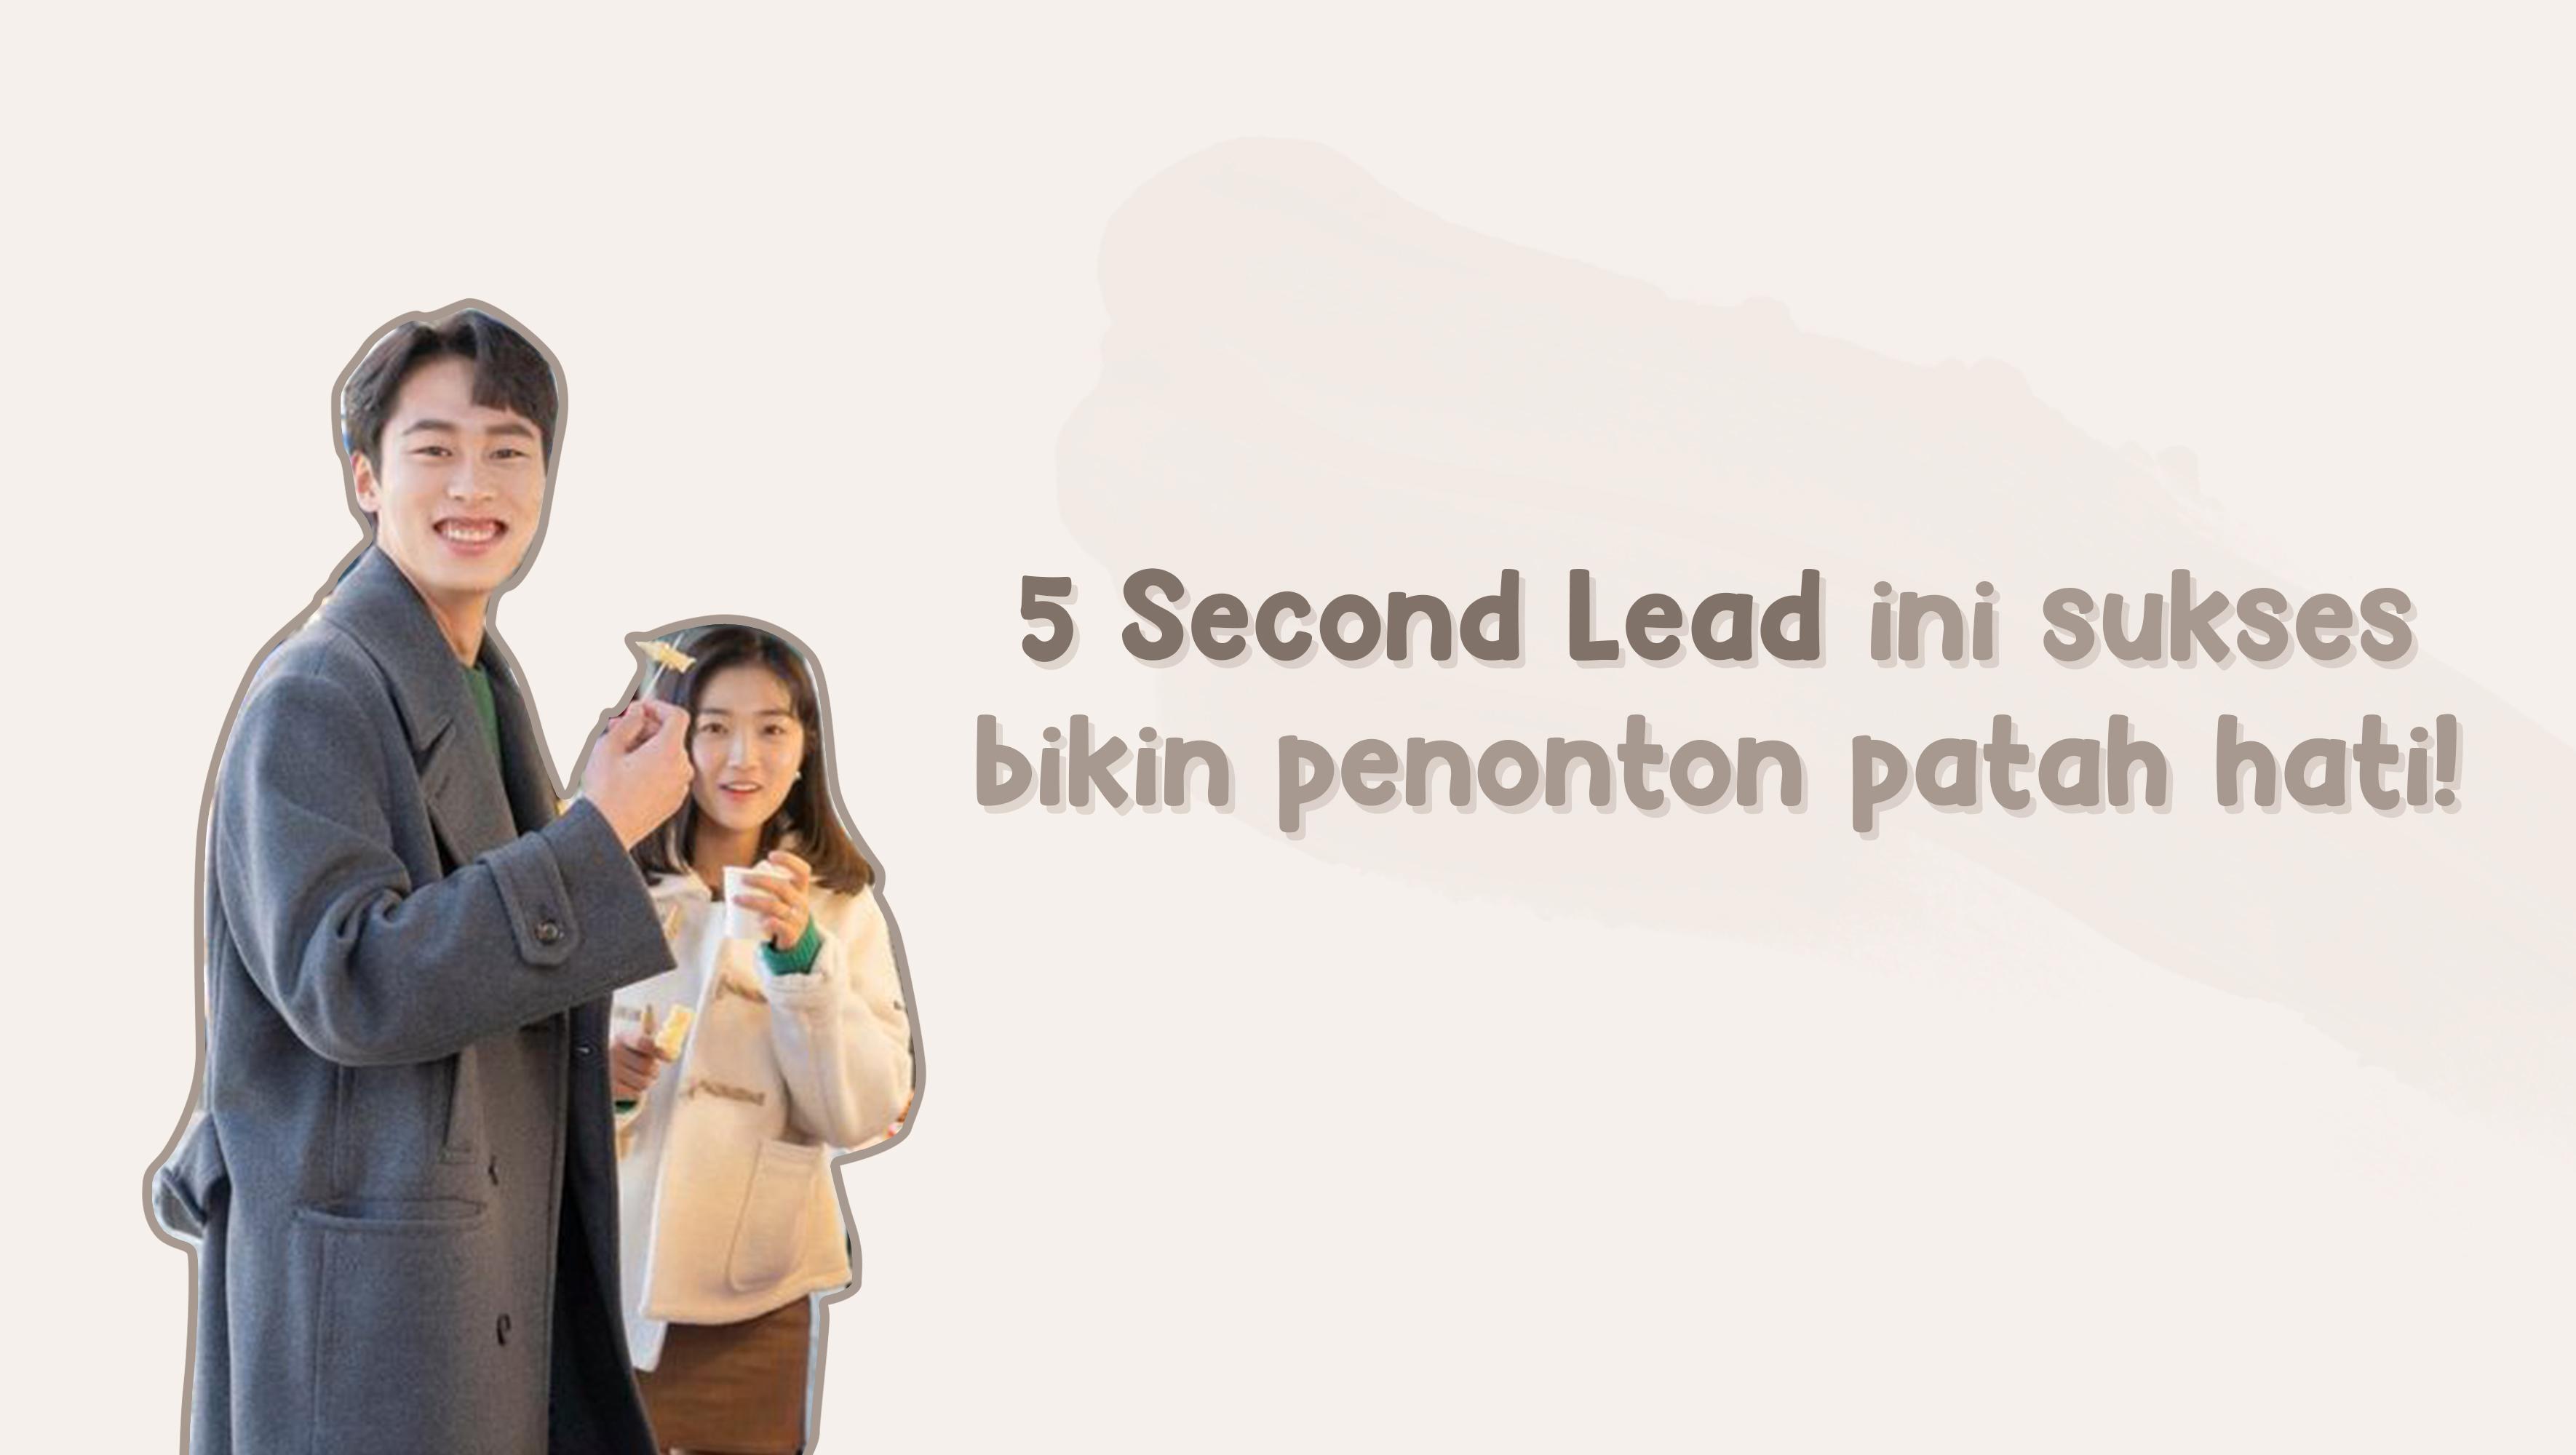 5 Second Lead ini sukses bikin penonton patah hati! image